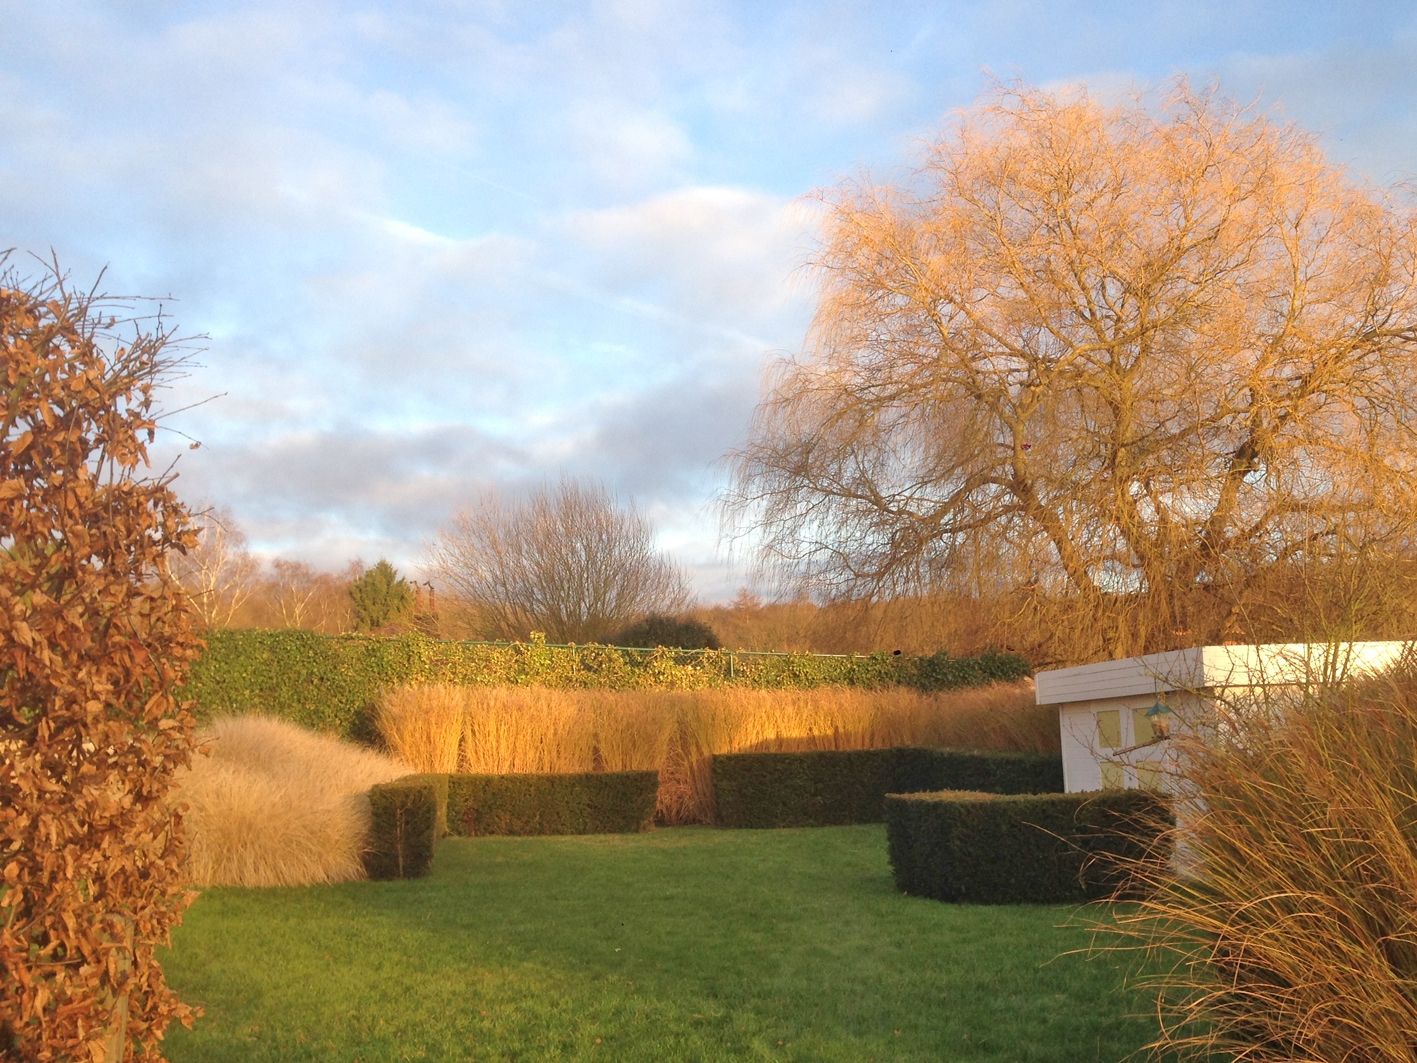 Structure du jardin hivernal